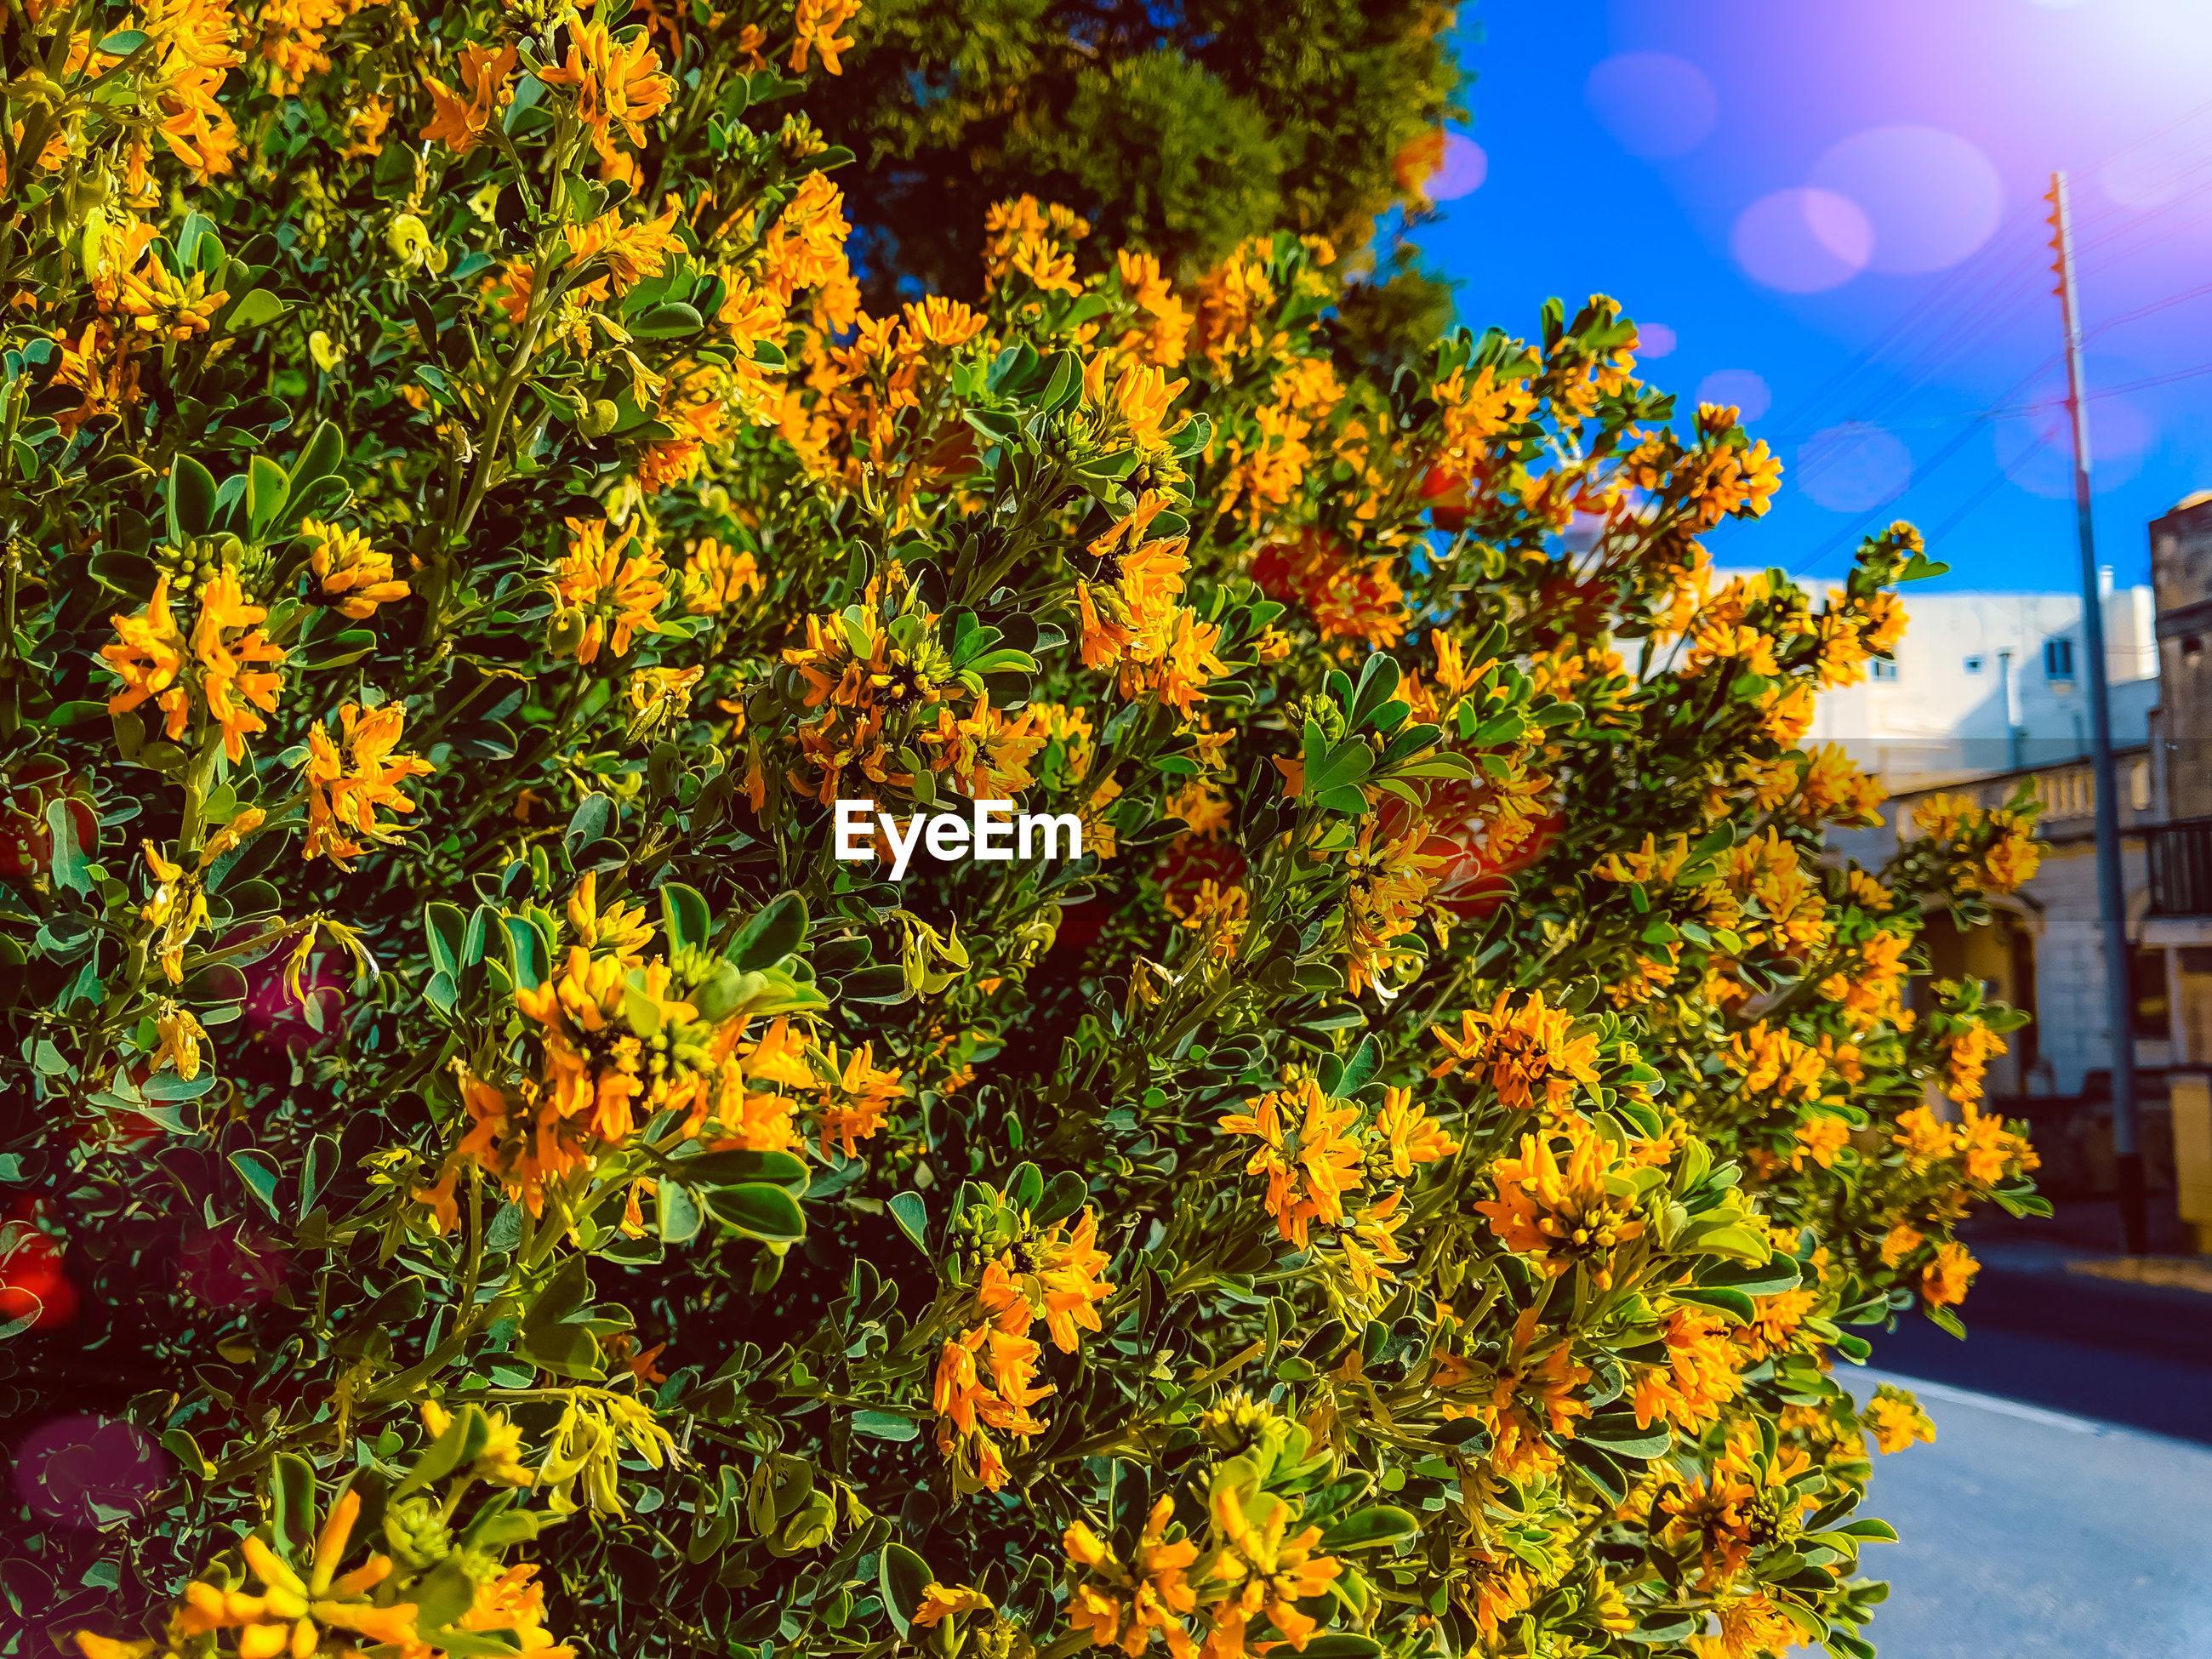 SCENIC VIEW OF ORANGE FLOWERING PLANT AGAINST SKY